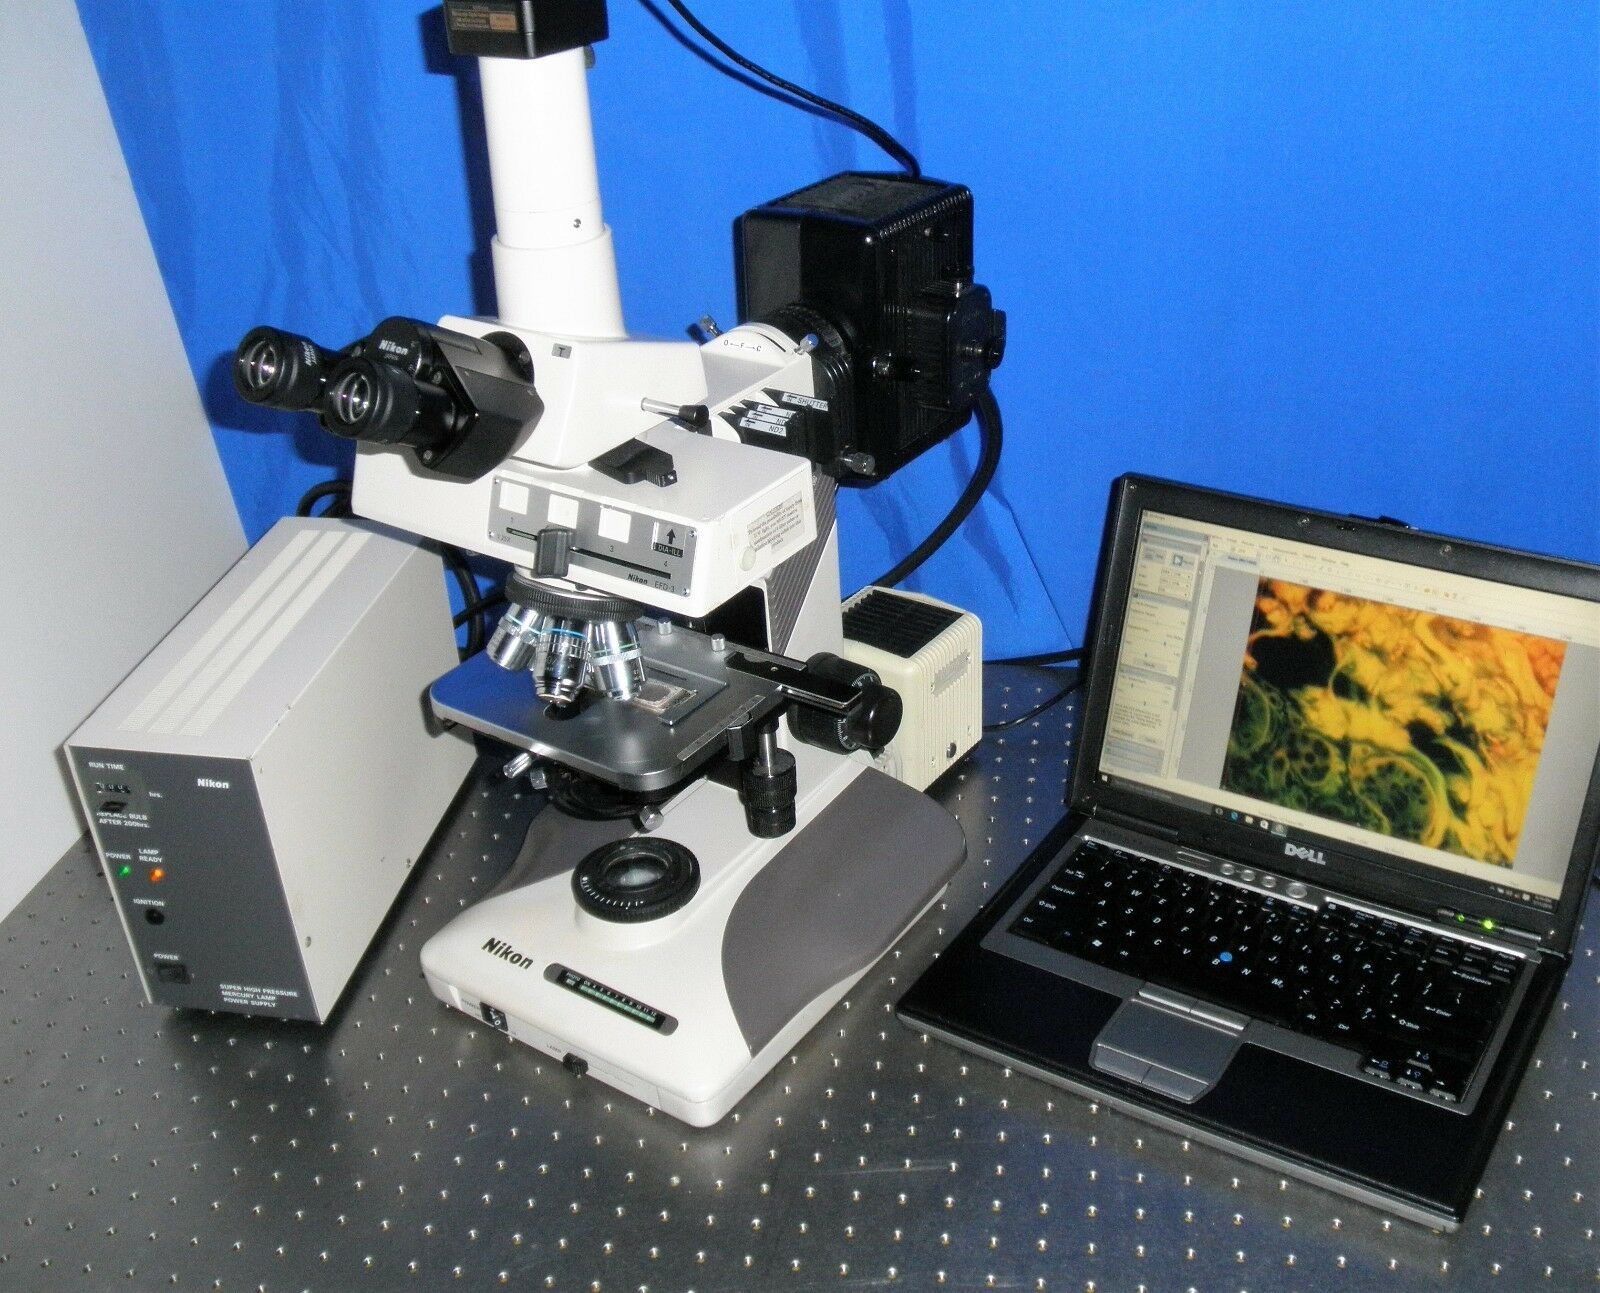 Nikon optiphot 2 trinokulares fluoreszenz mikroskop 3 objektive